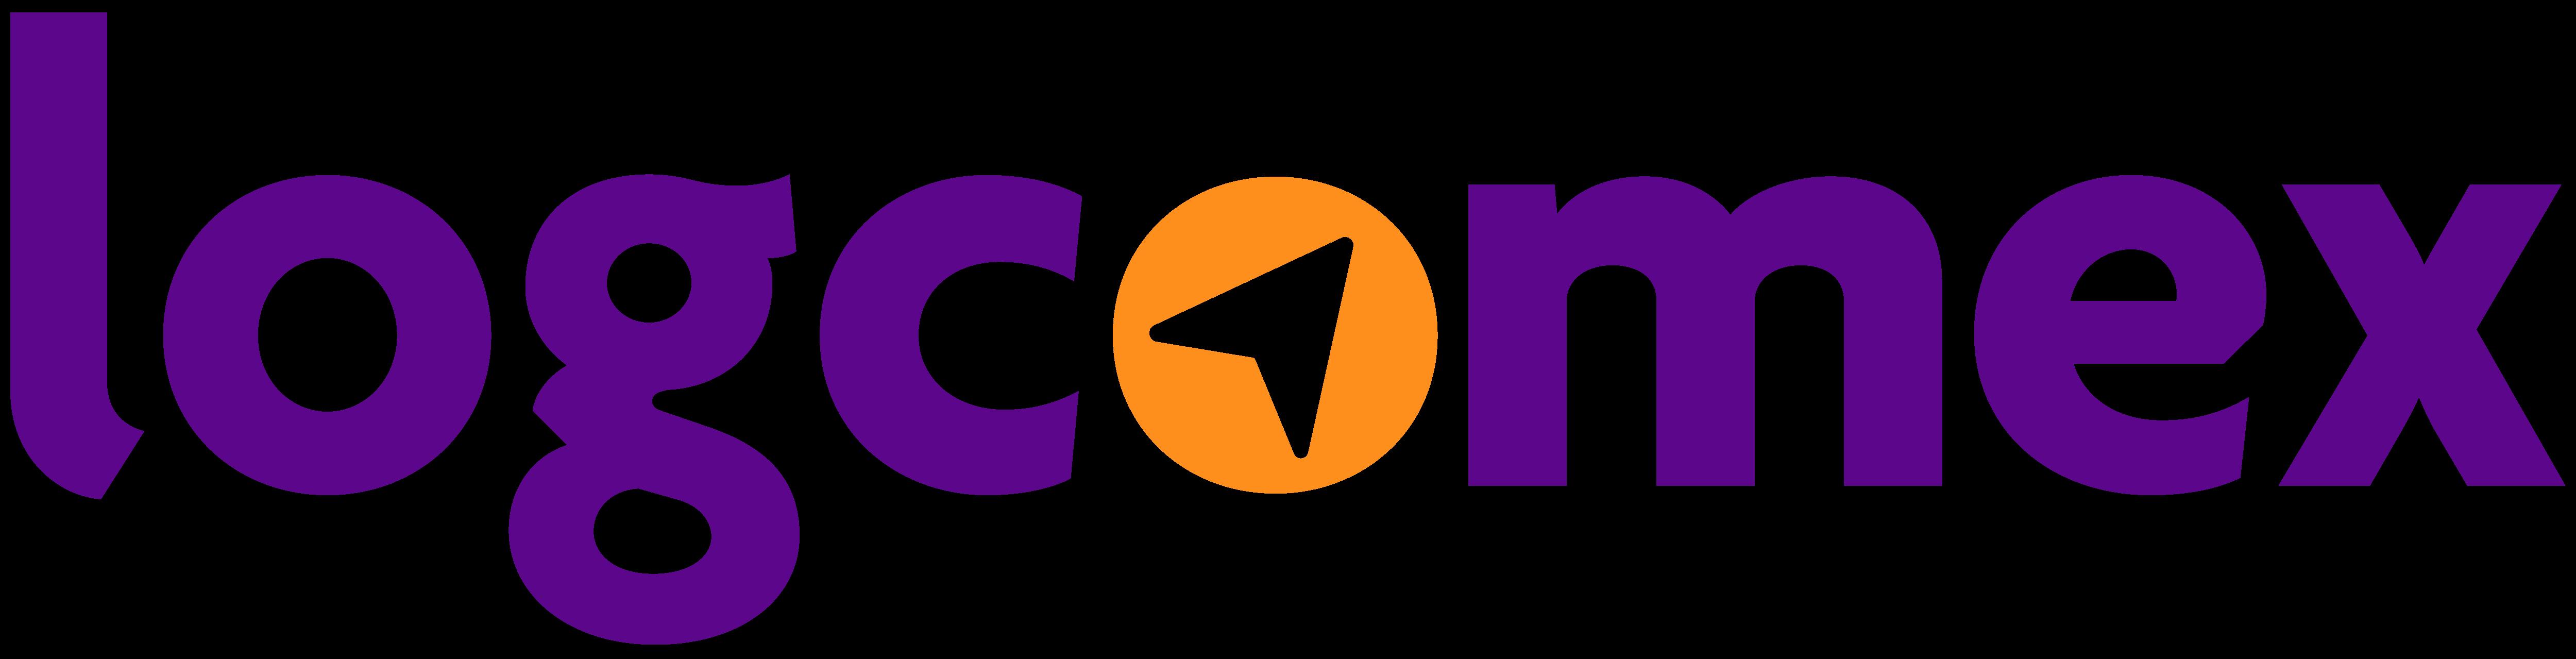 Logotipo Logcomex Roxo